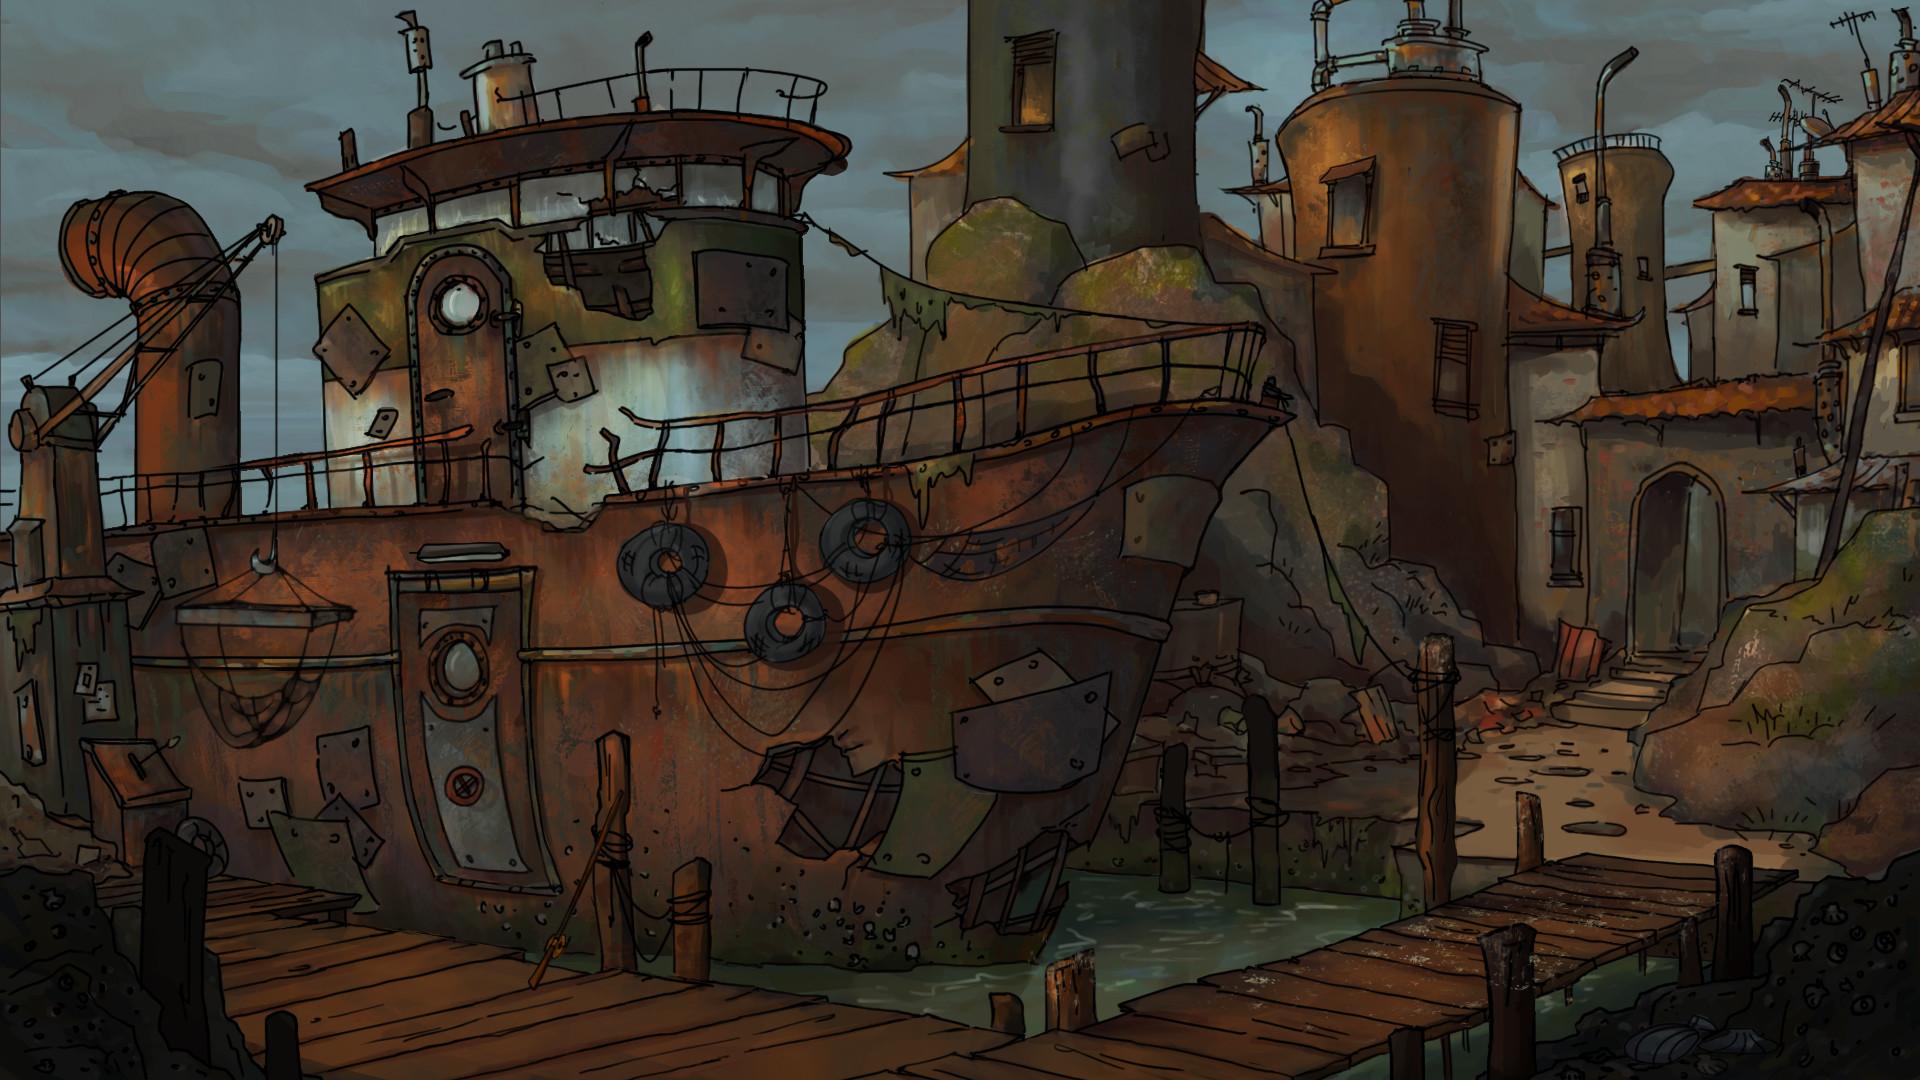 ArtStation - CANINE 49 -- 2D Point & Click Adventure -- Backgrounds